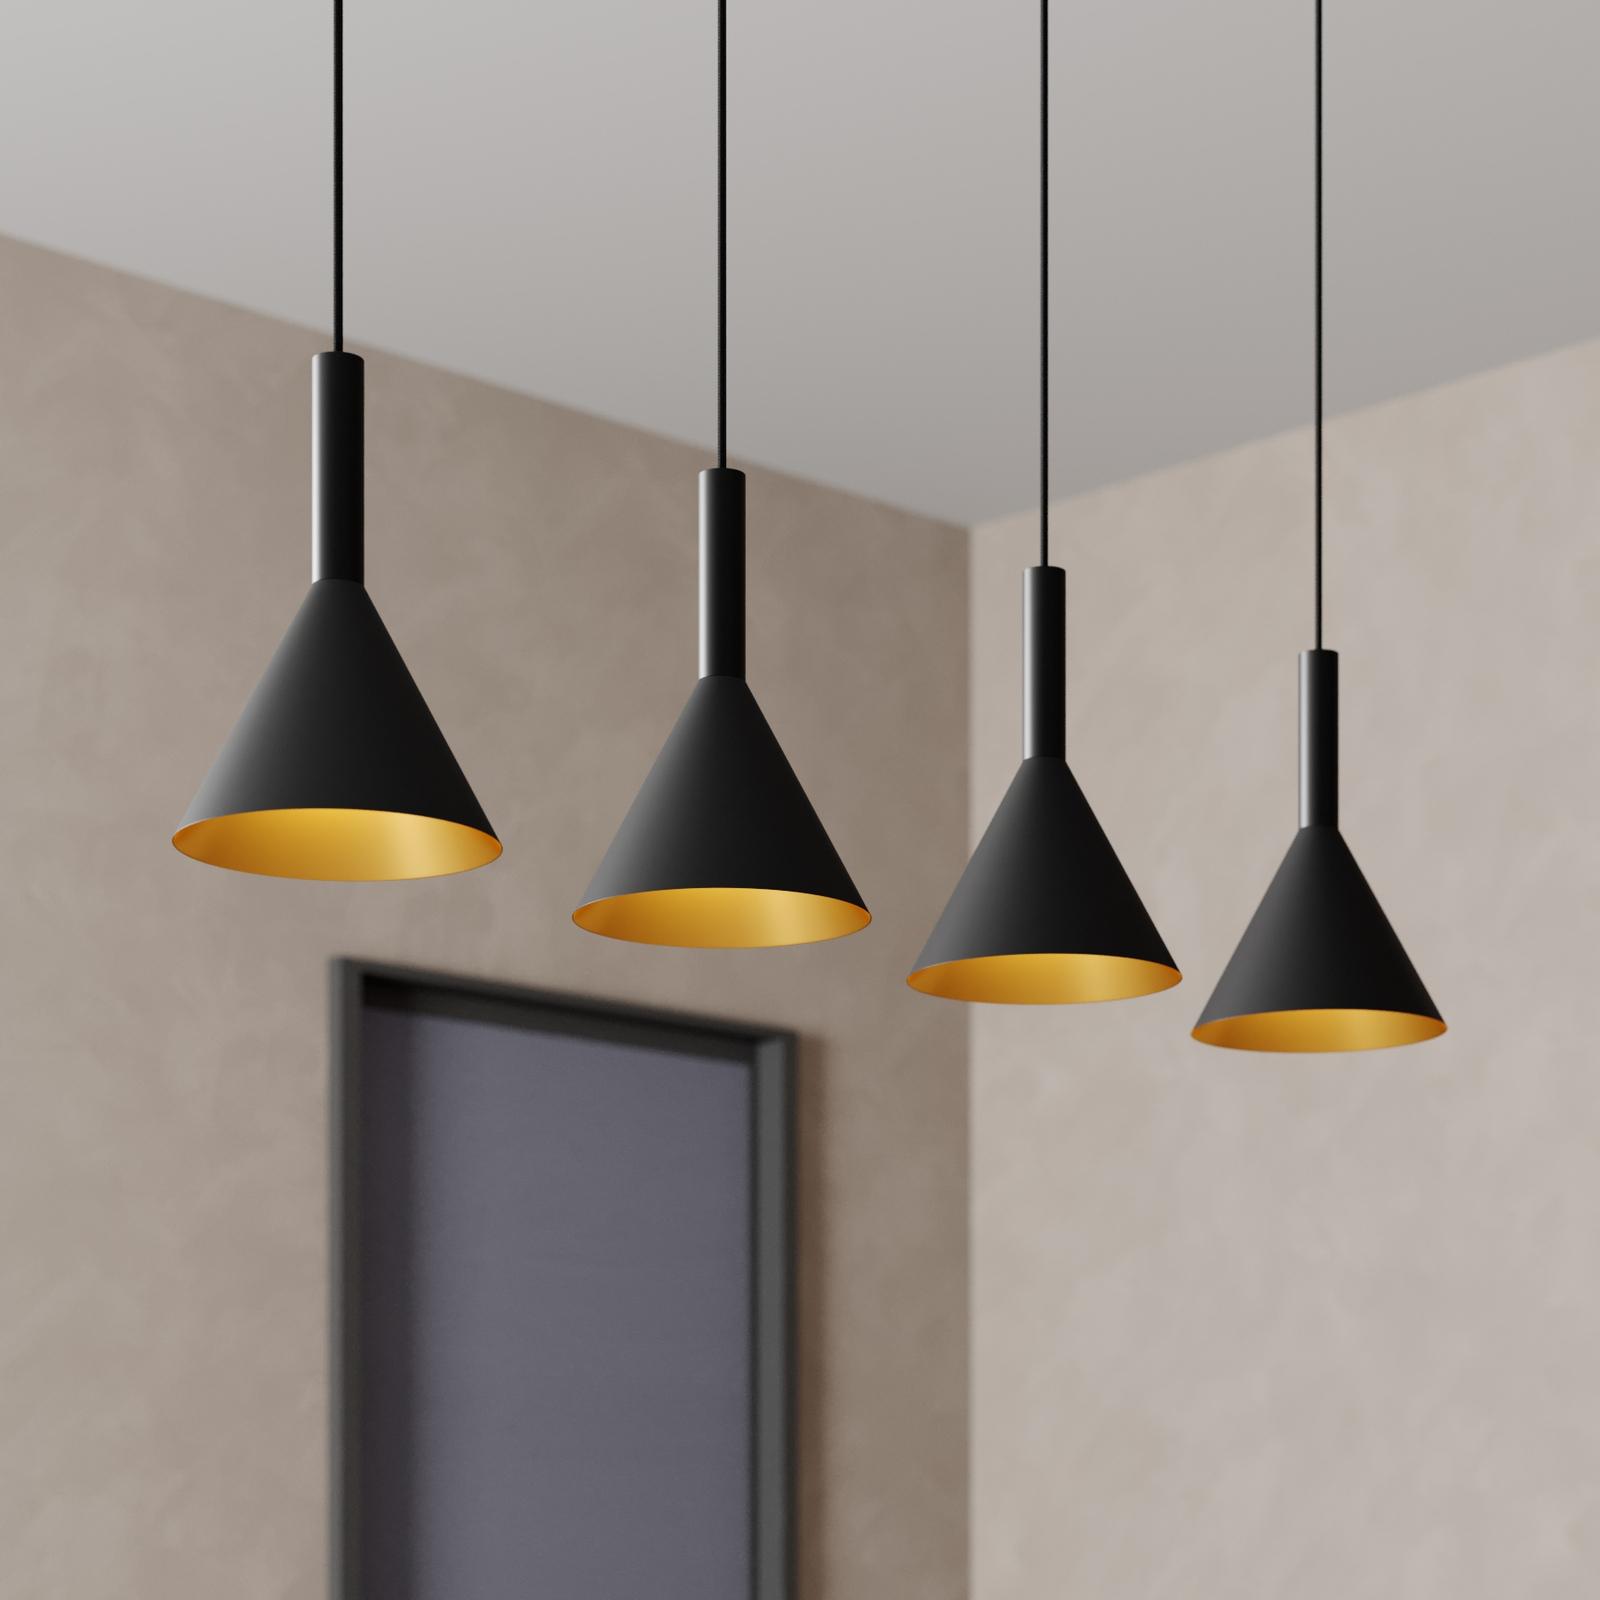 Arcchio Marcello hengelampe 4 lys, svart-gull